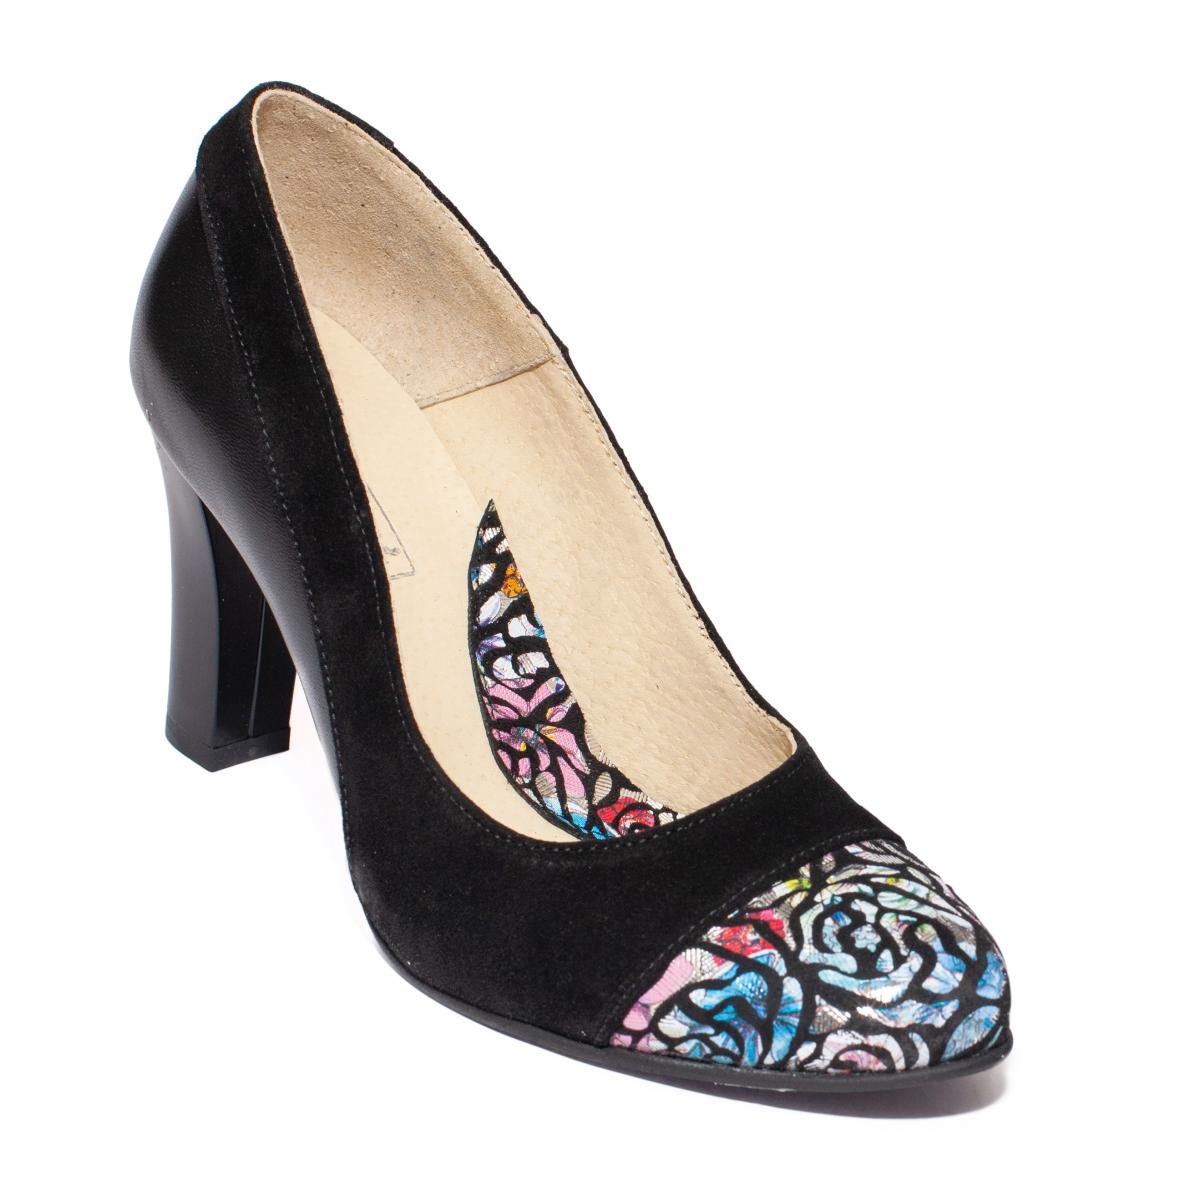 Pantofi cu toc dama 952 negru print 33-40